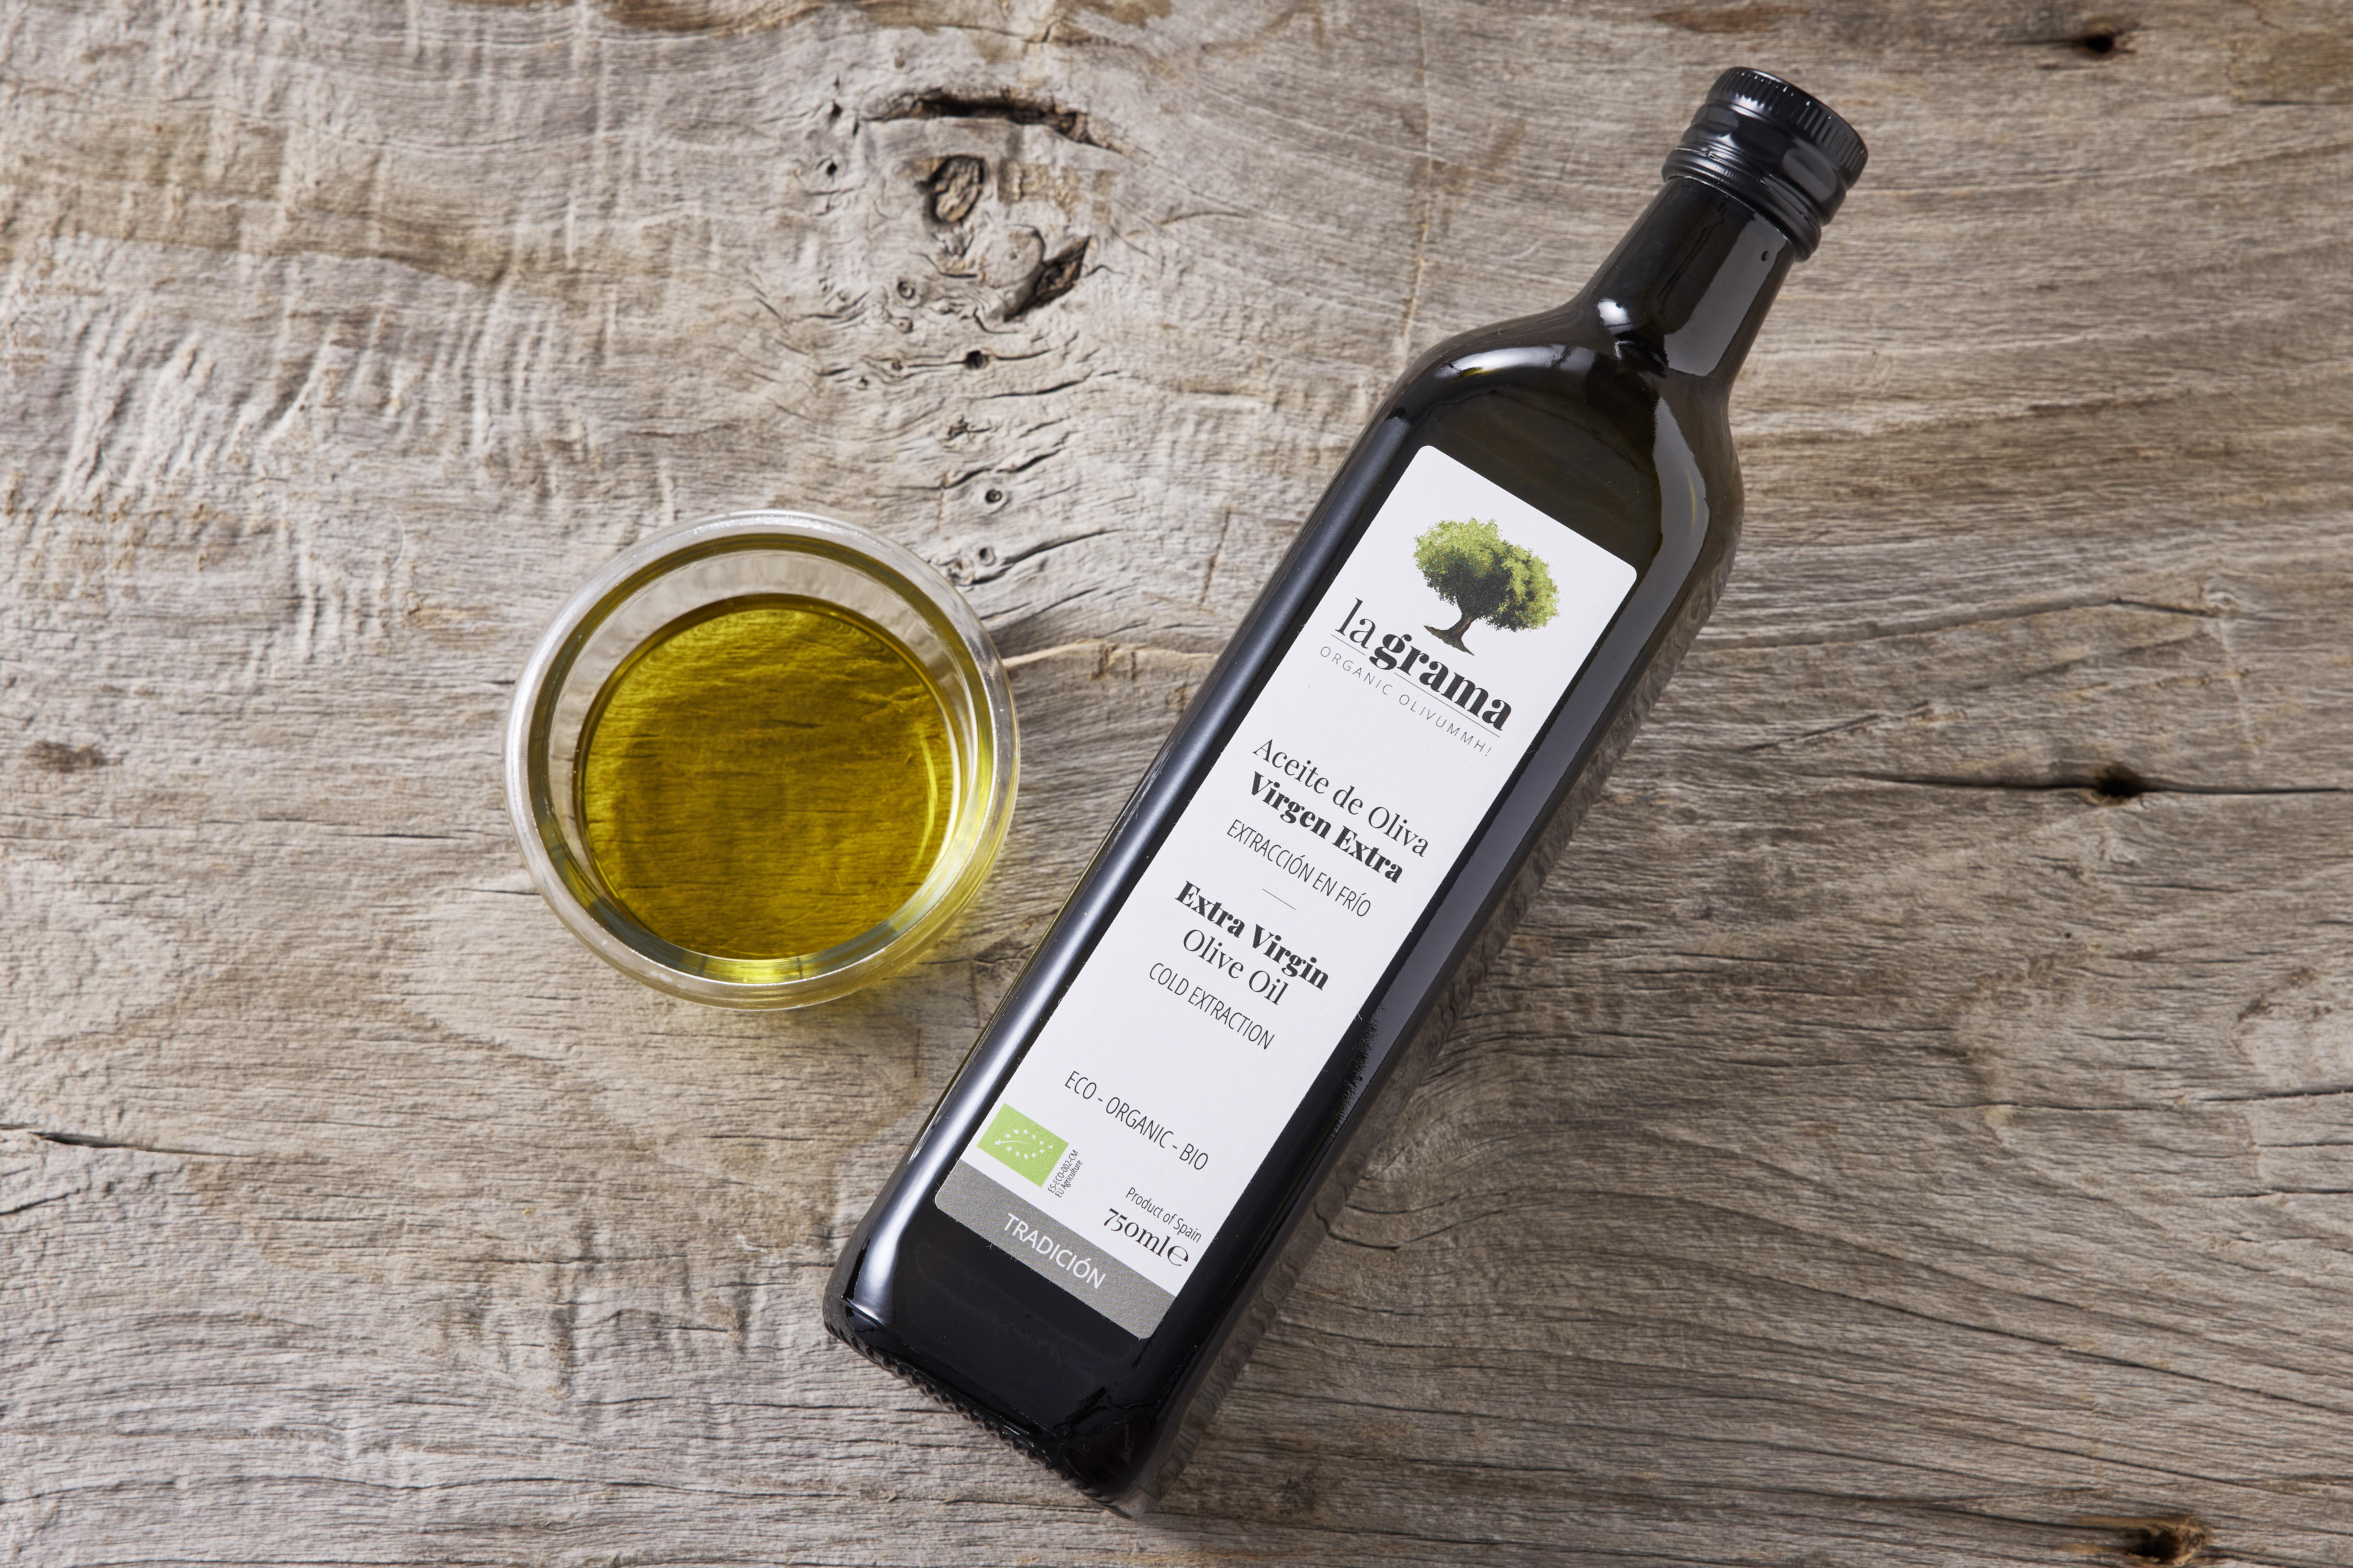 Bio Huile d'olive extra vierge La Grama